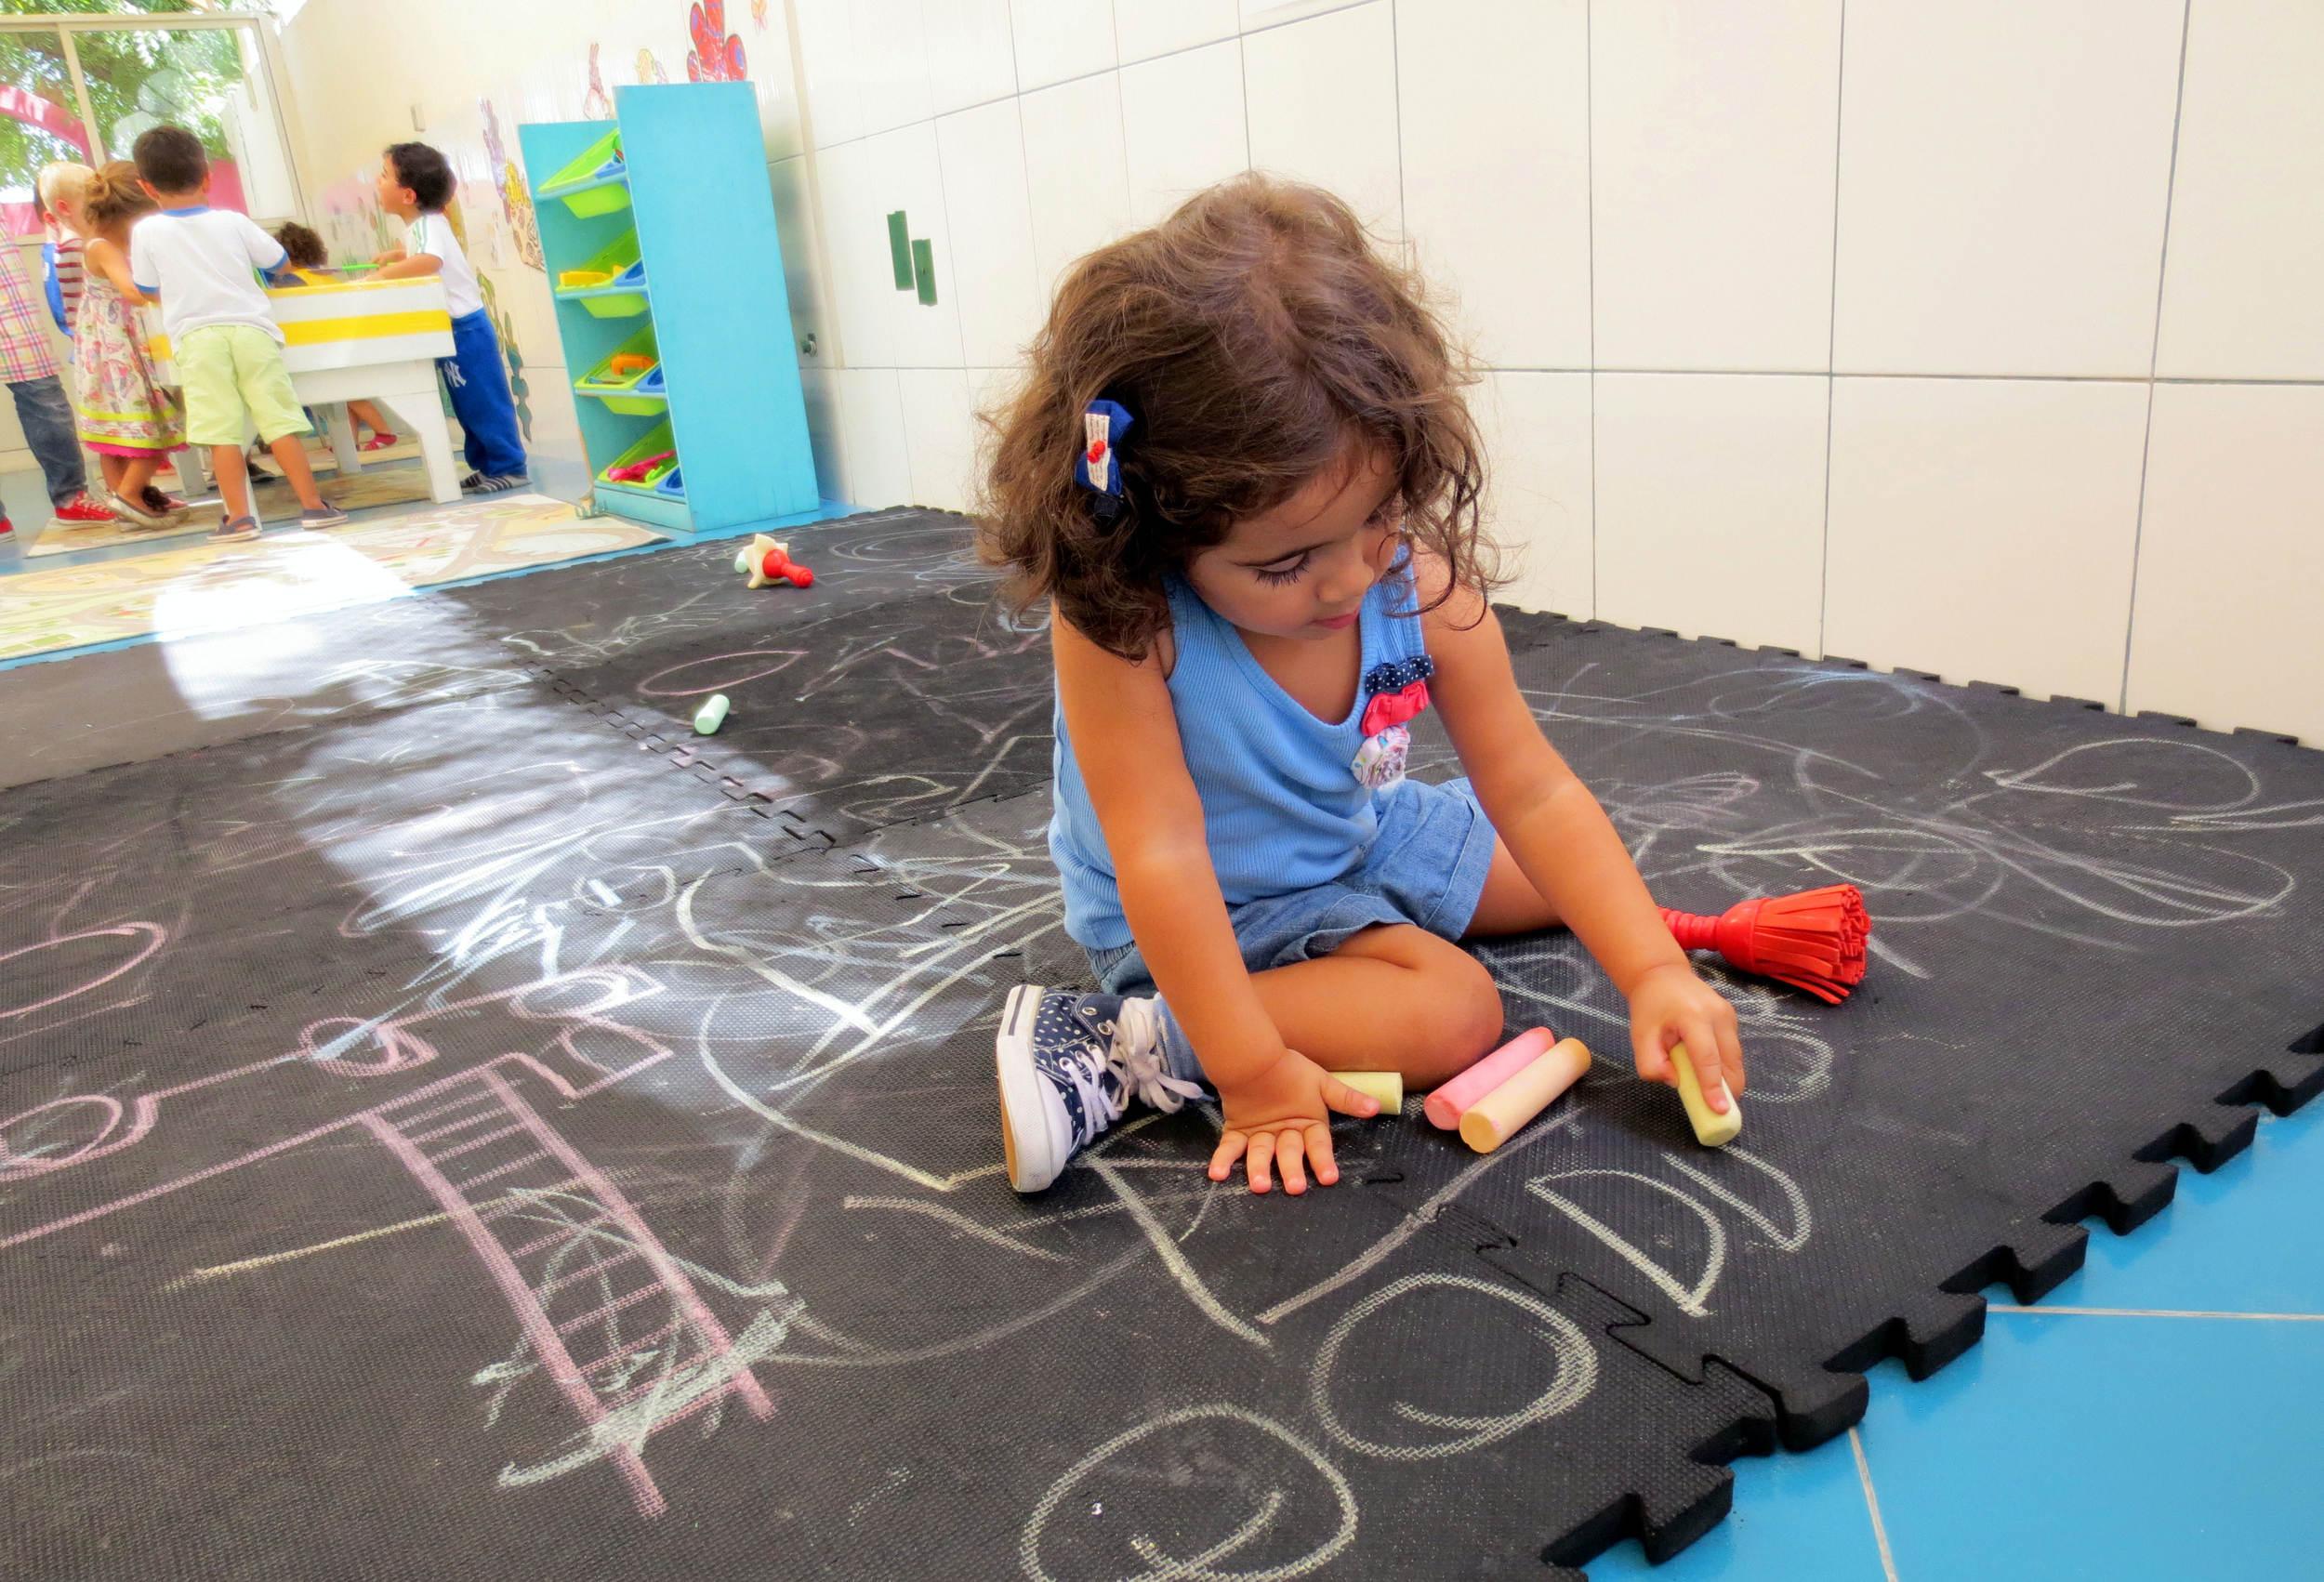 Chalkboard Drawing on Floor